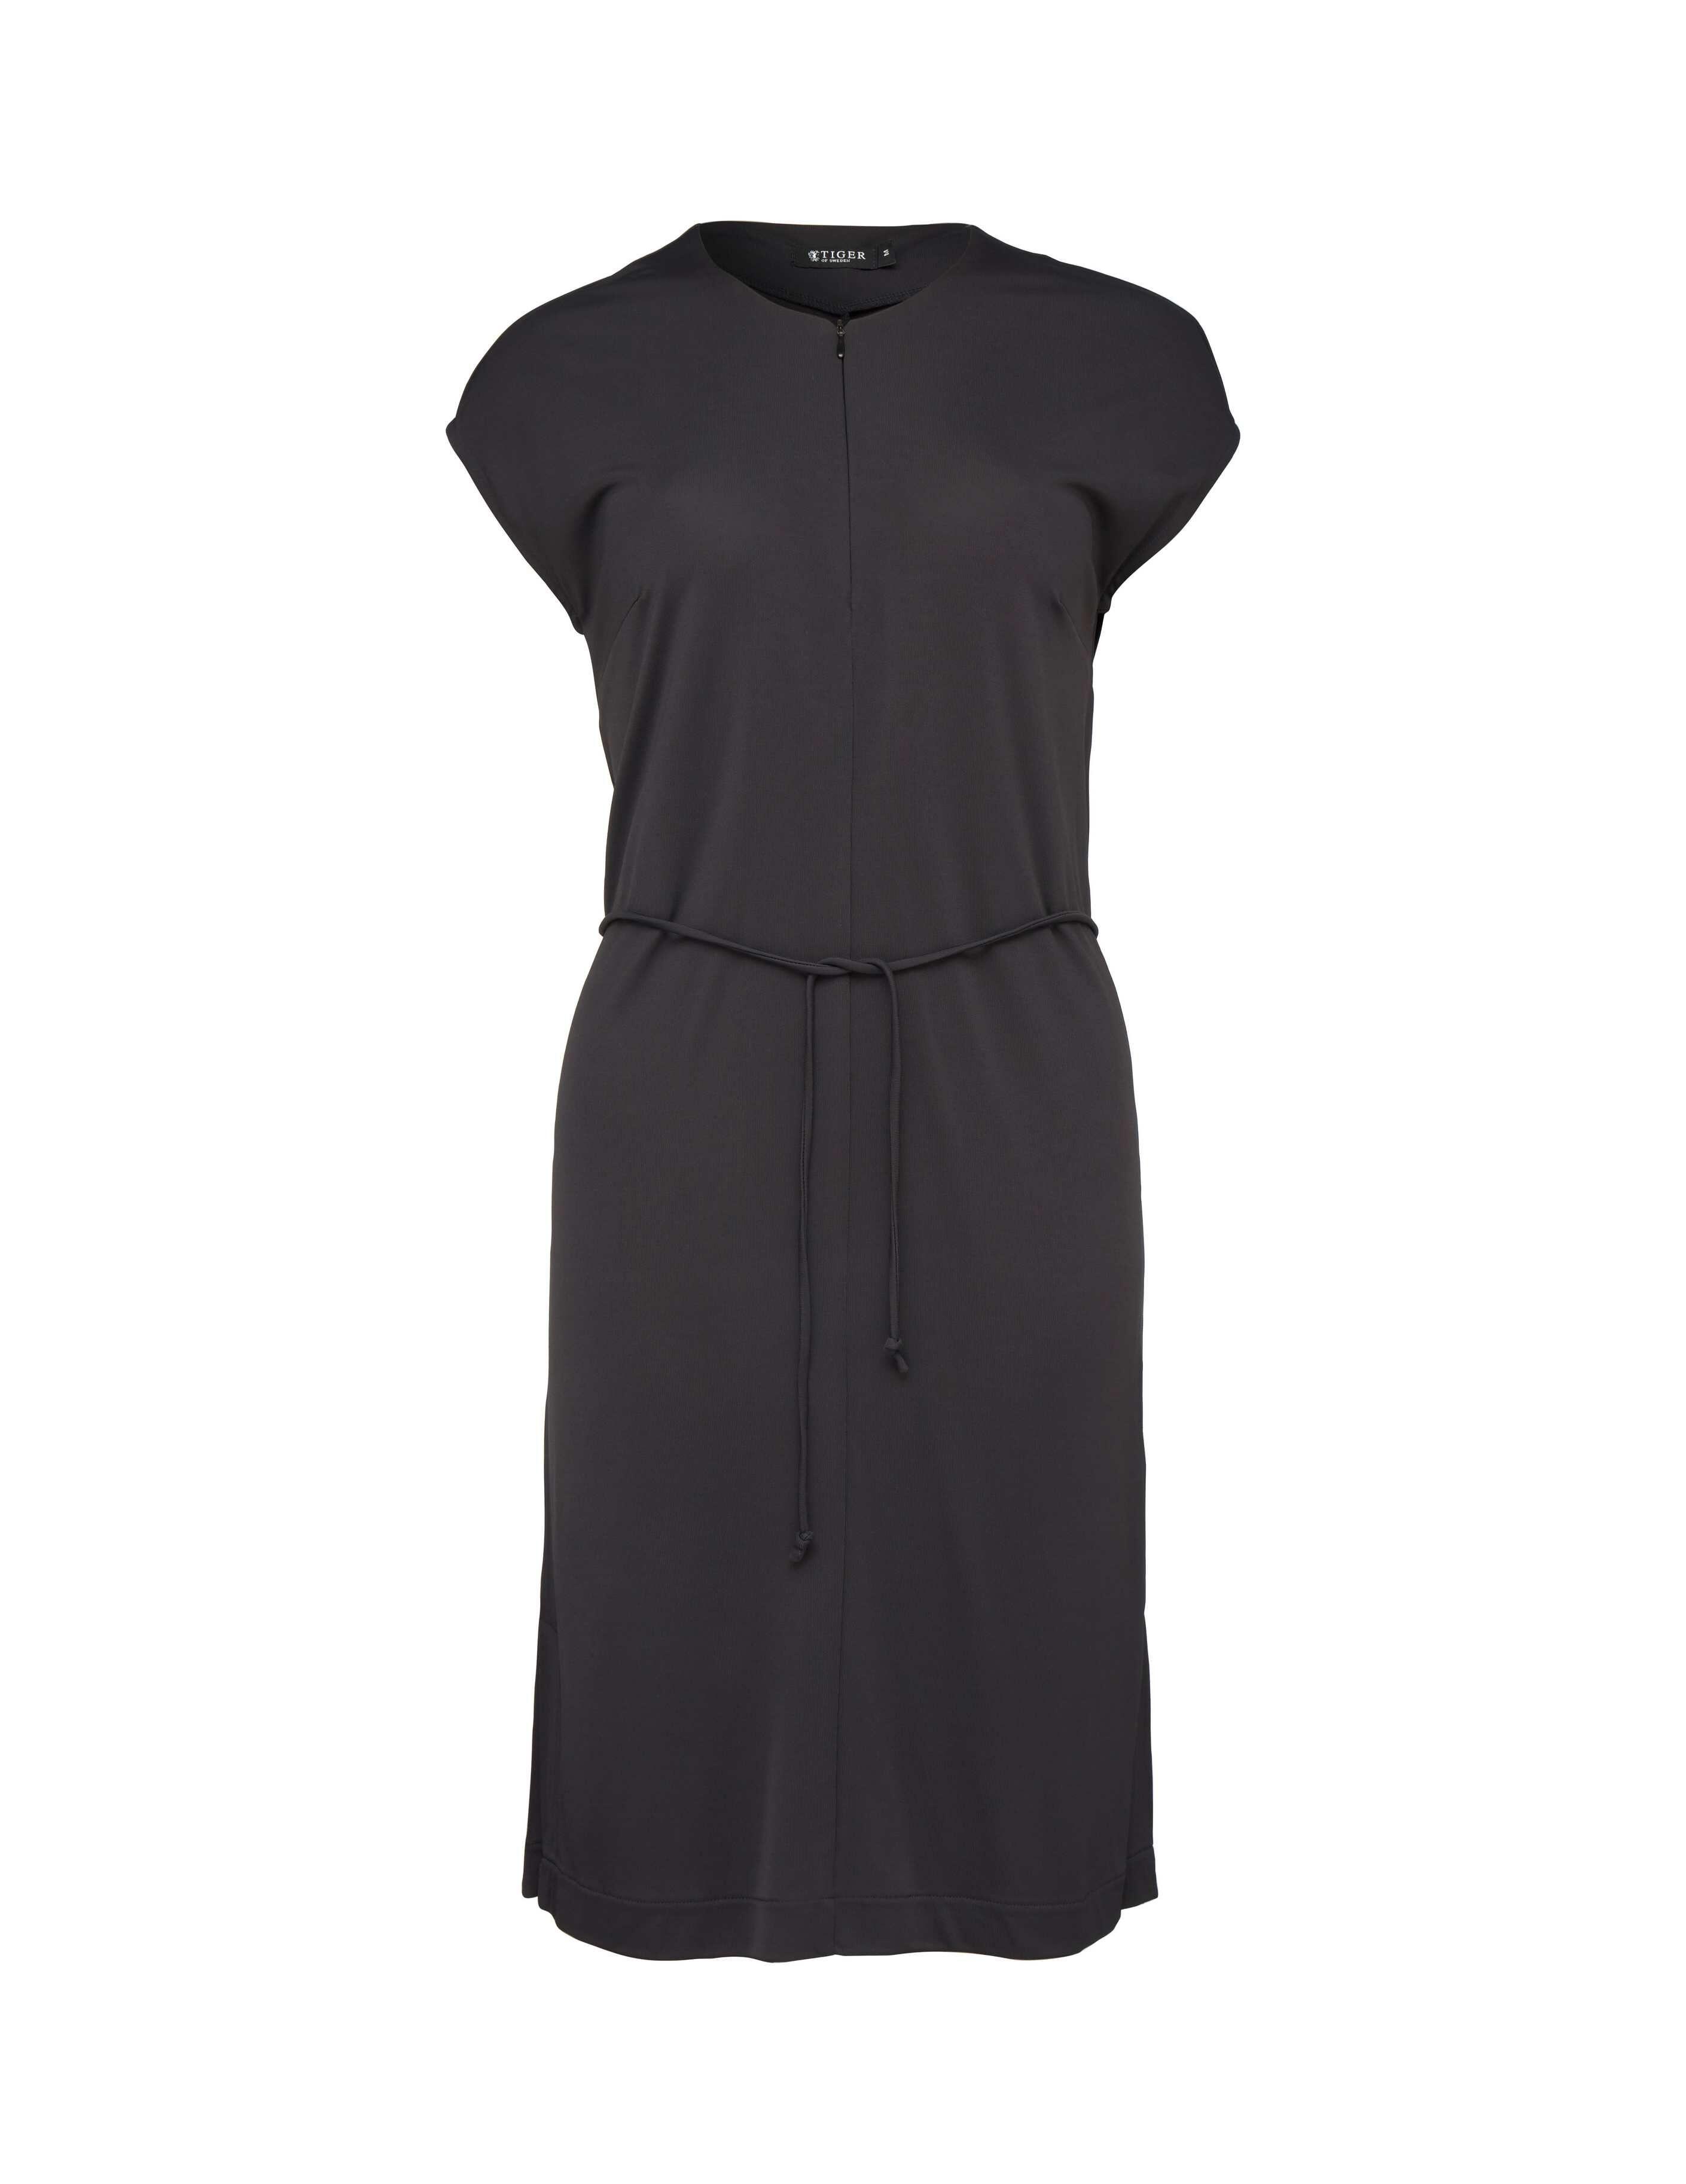 billiga evening dresses